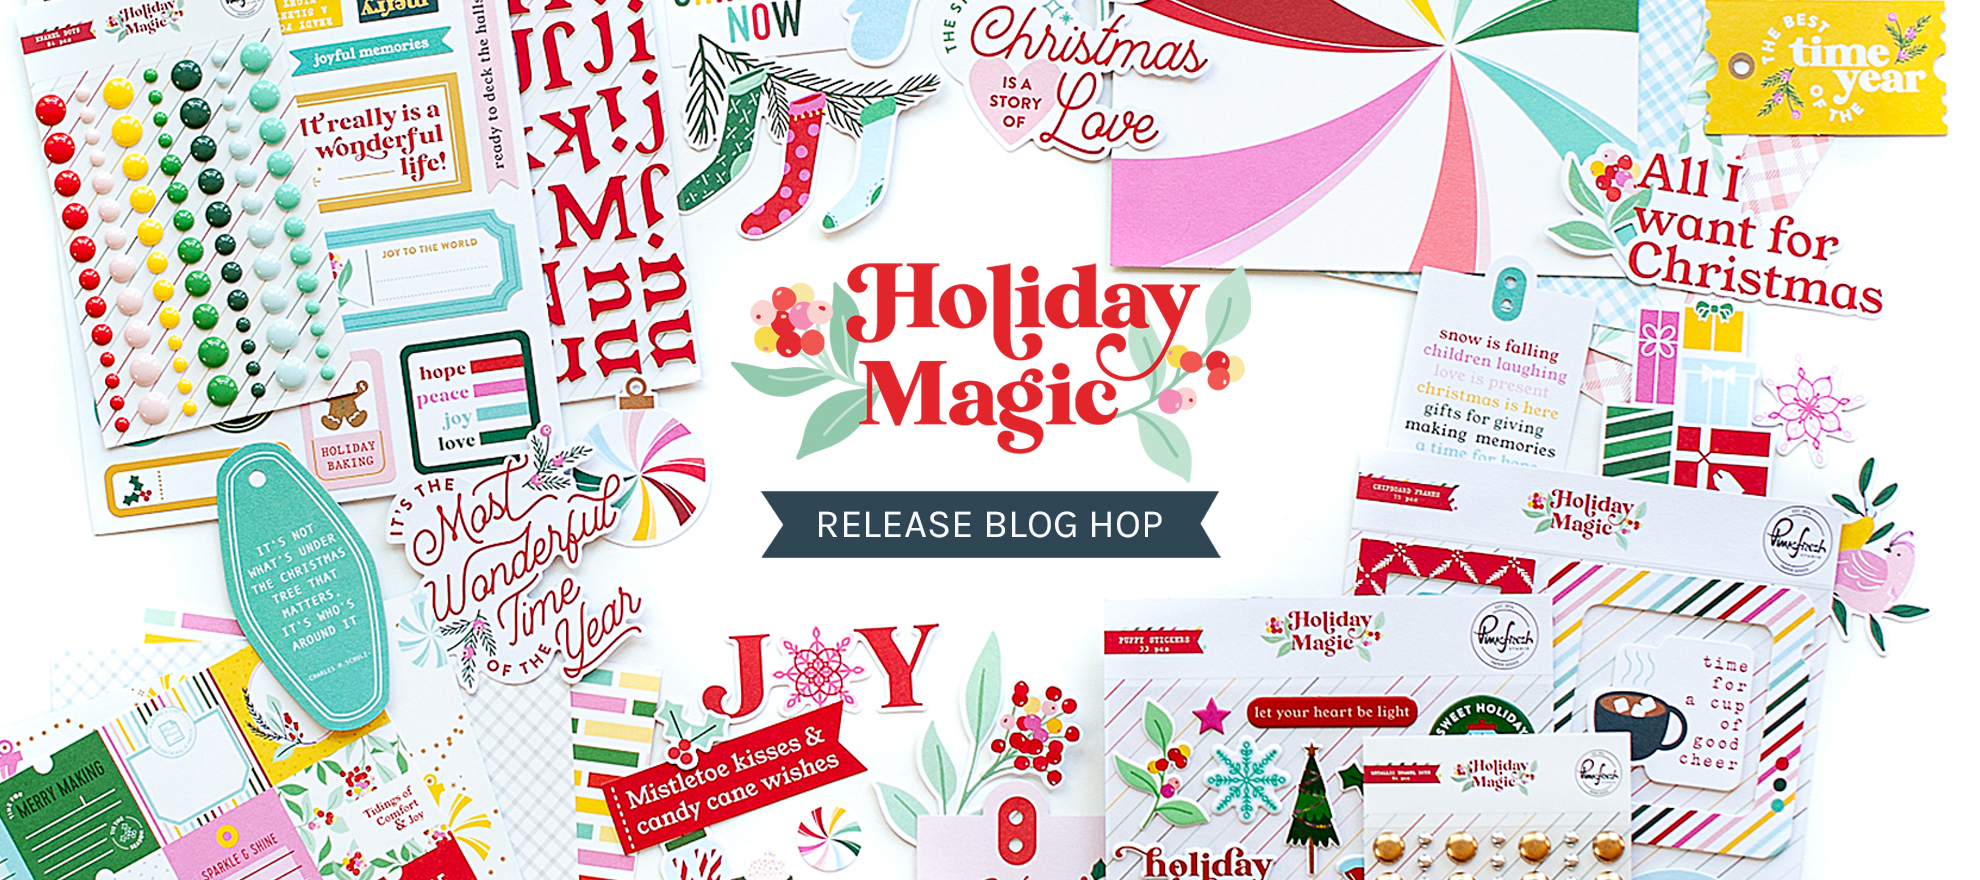 PinkFresh Studio Holiday Magic Collection Release Blog Hop 1